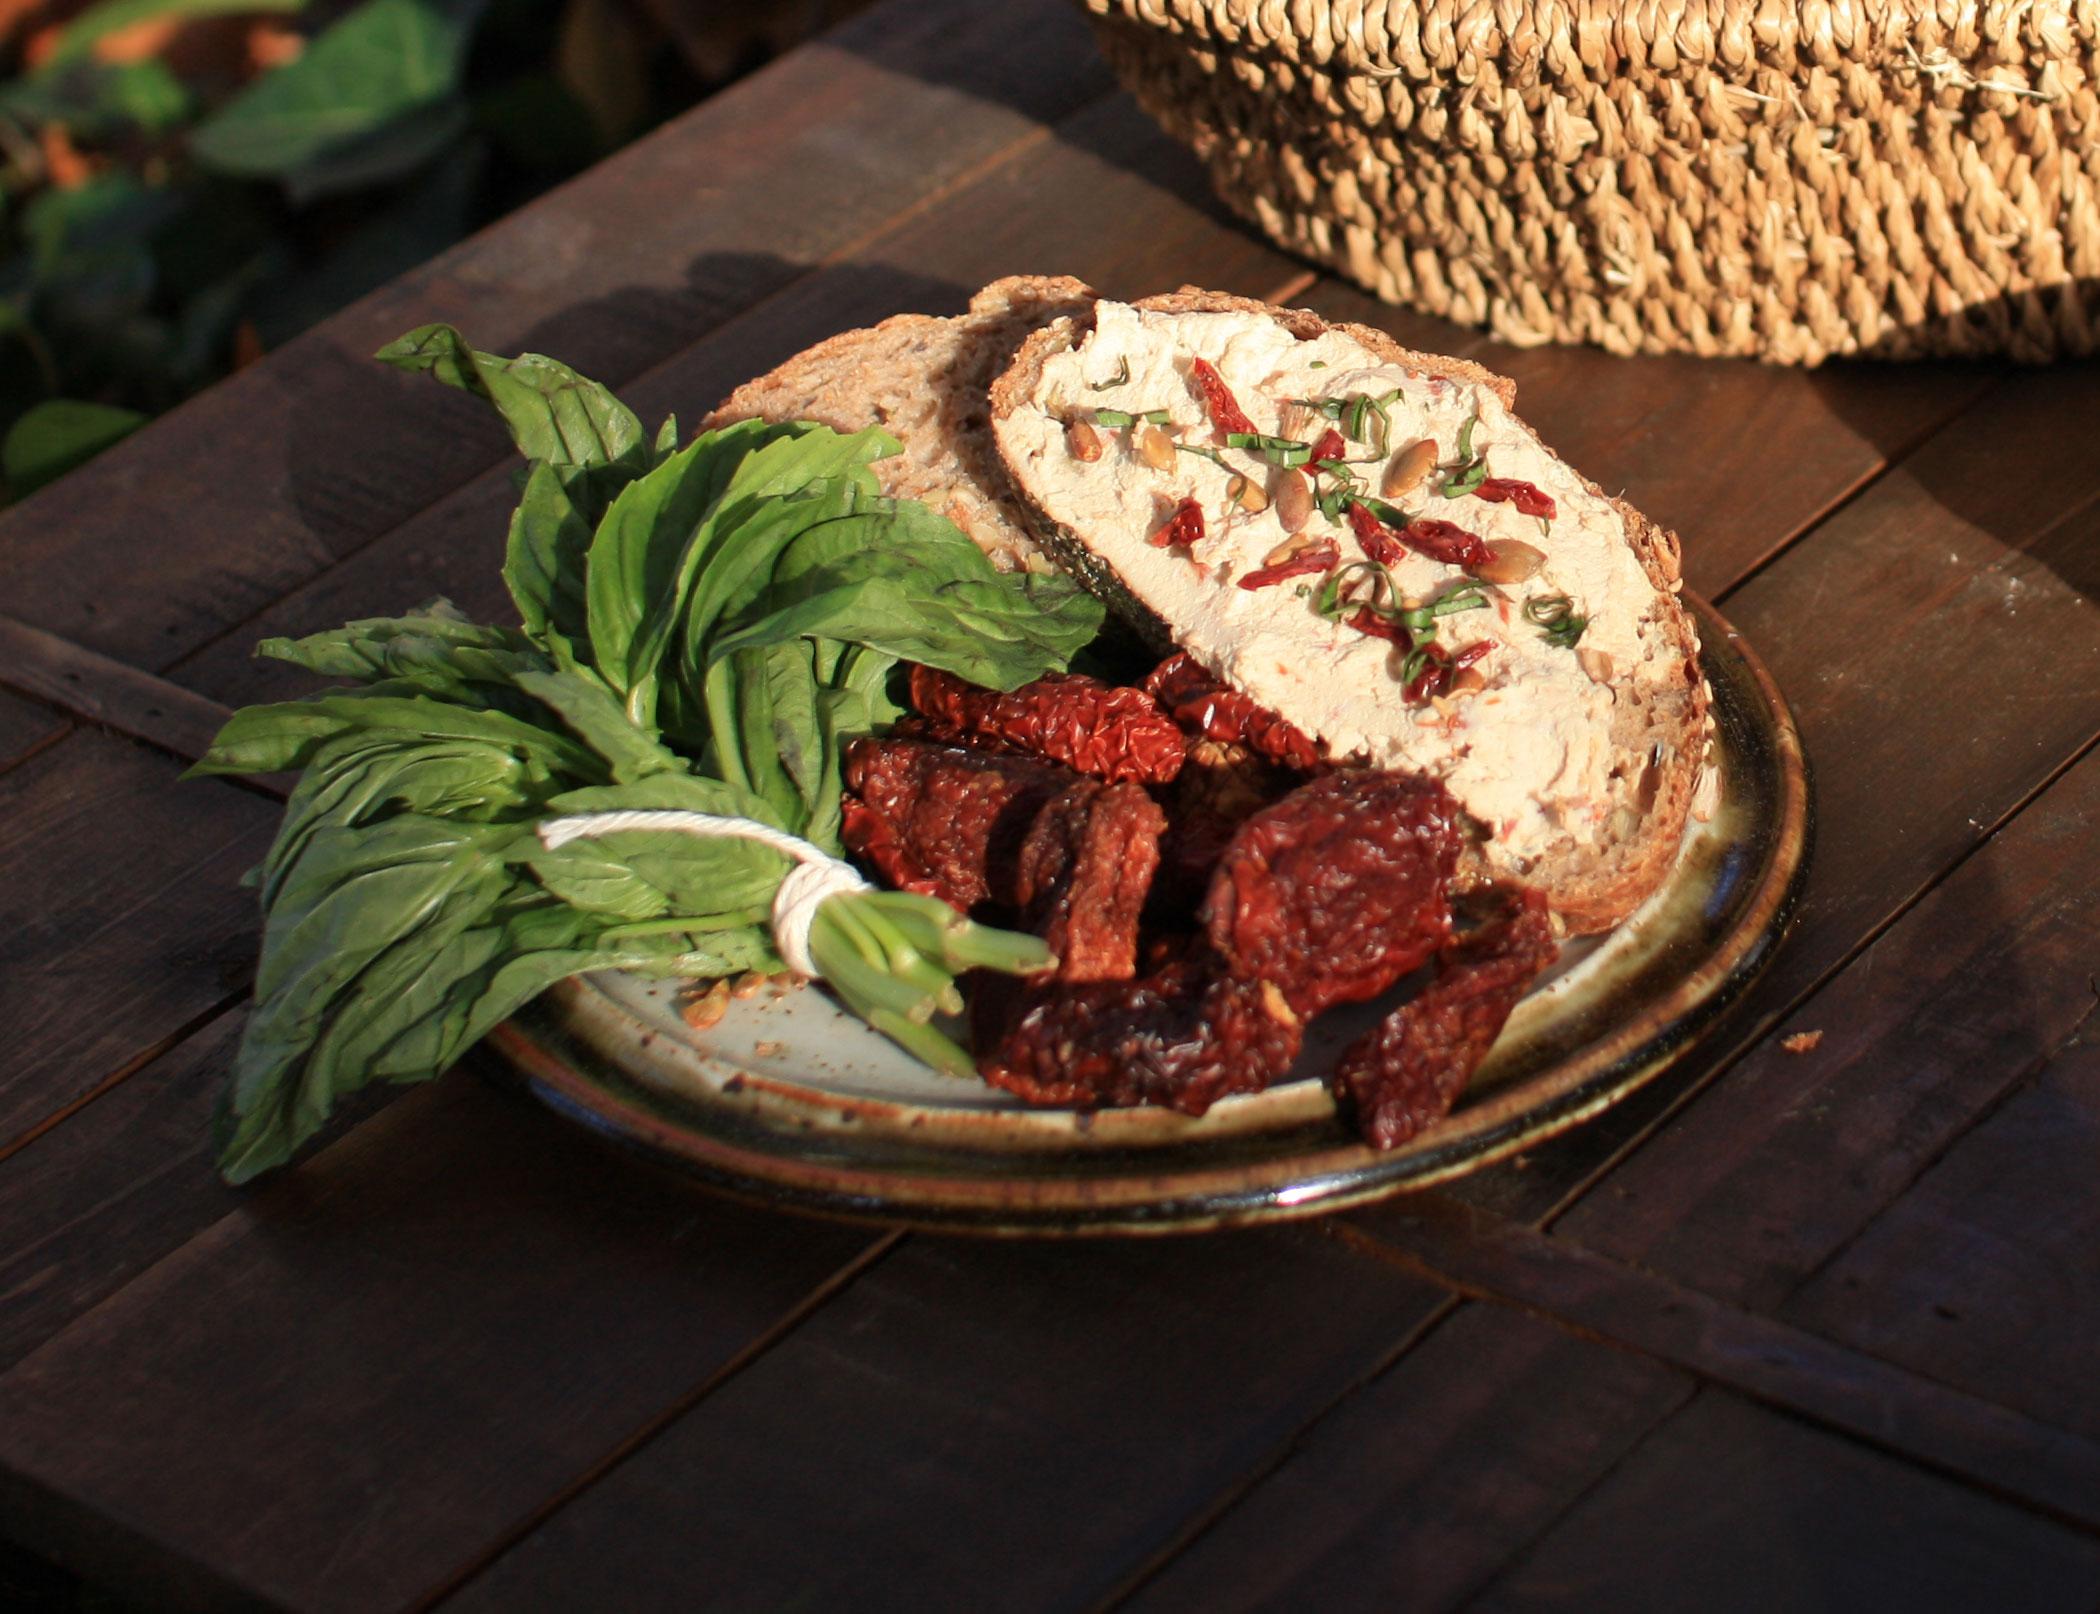 SDT - Vegan_sun_dried_tomato_basil_cheese1.jpg